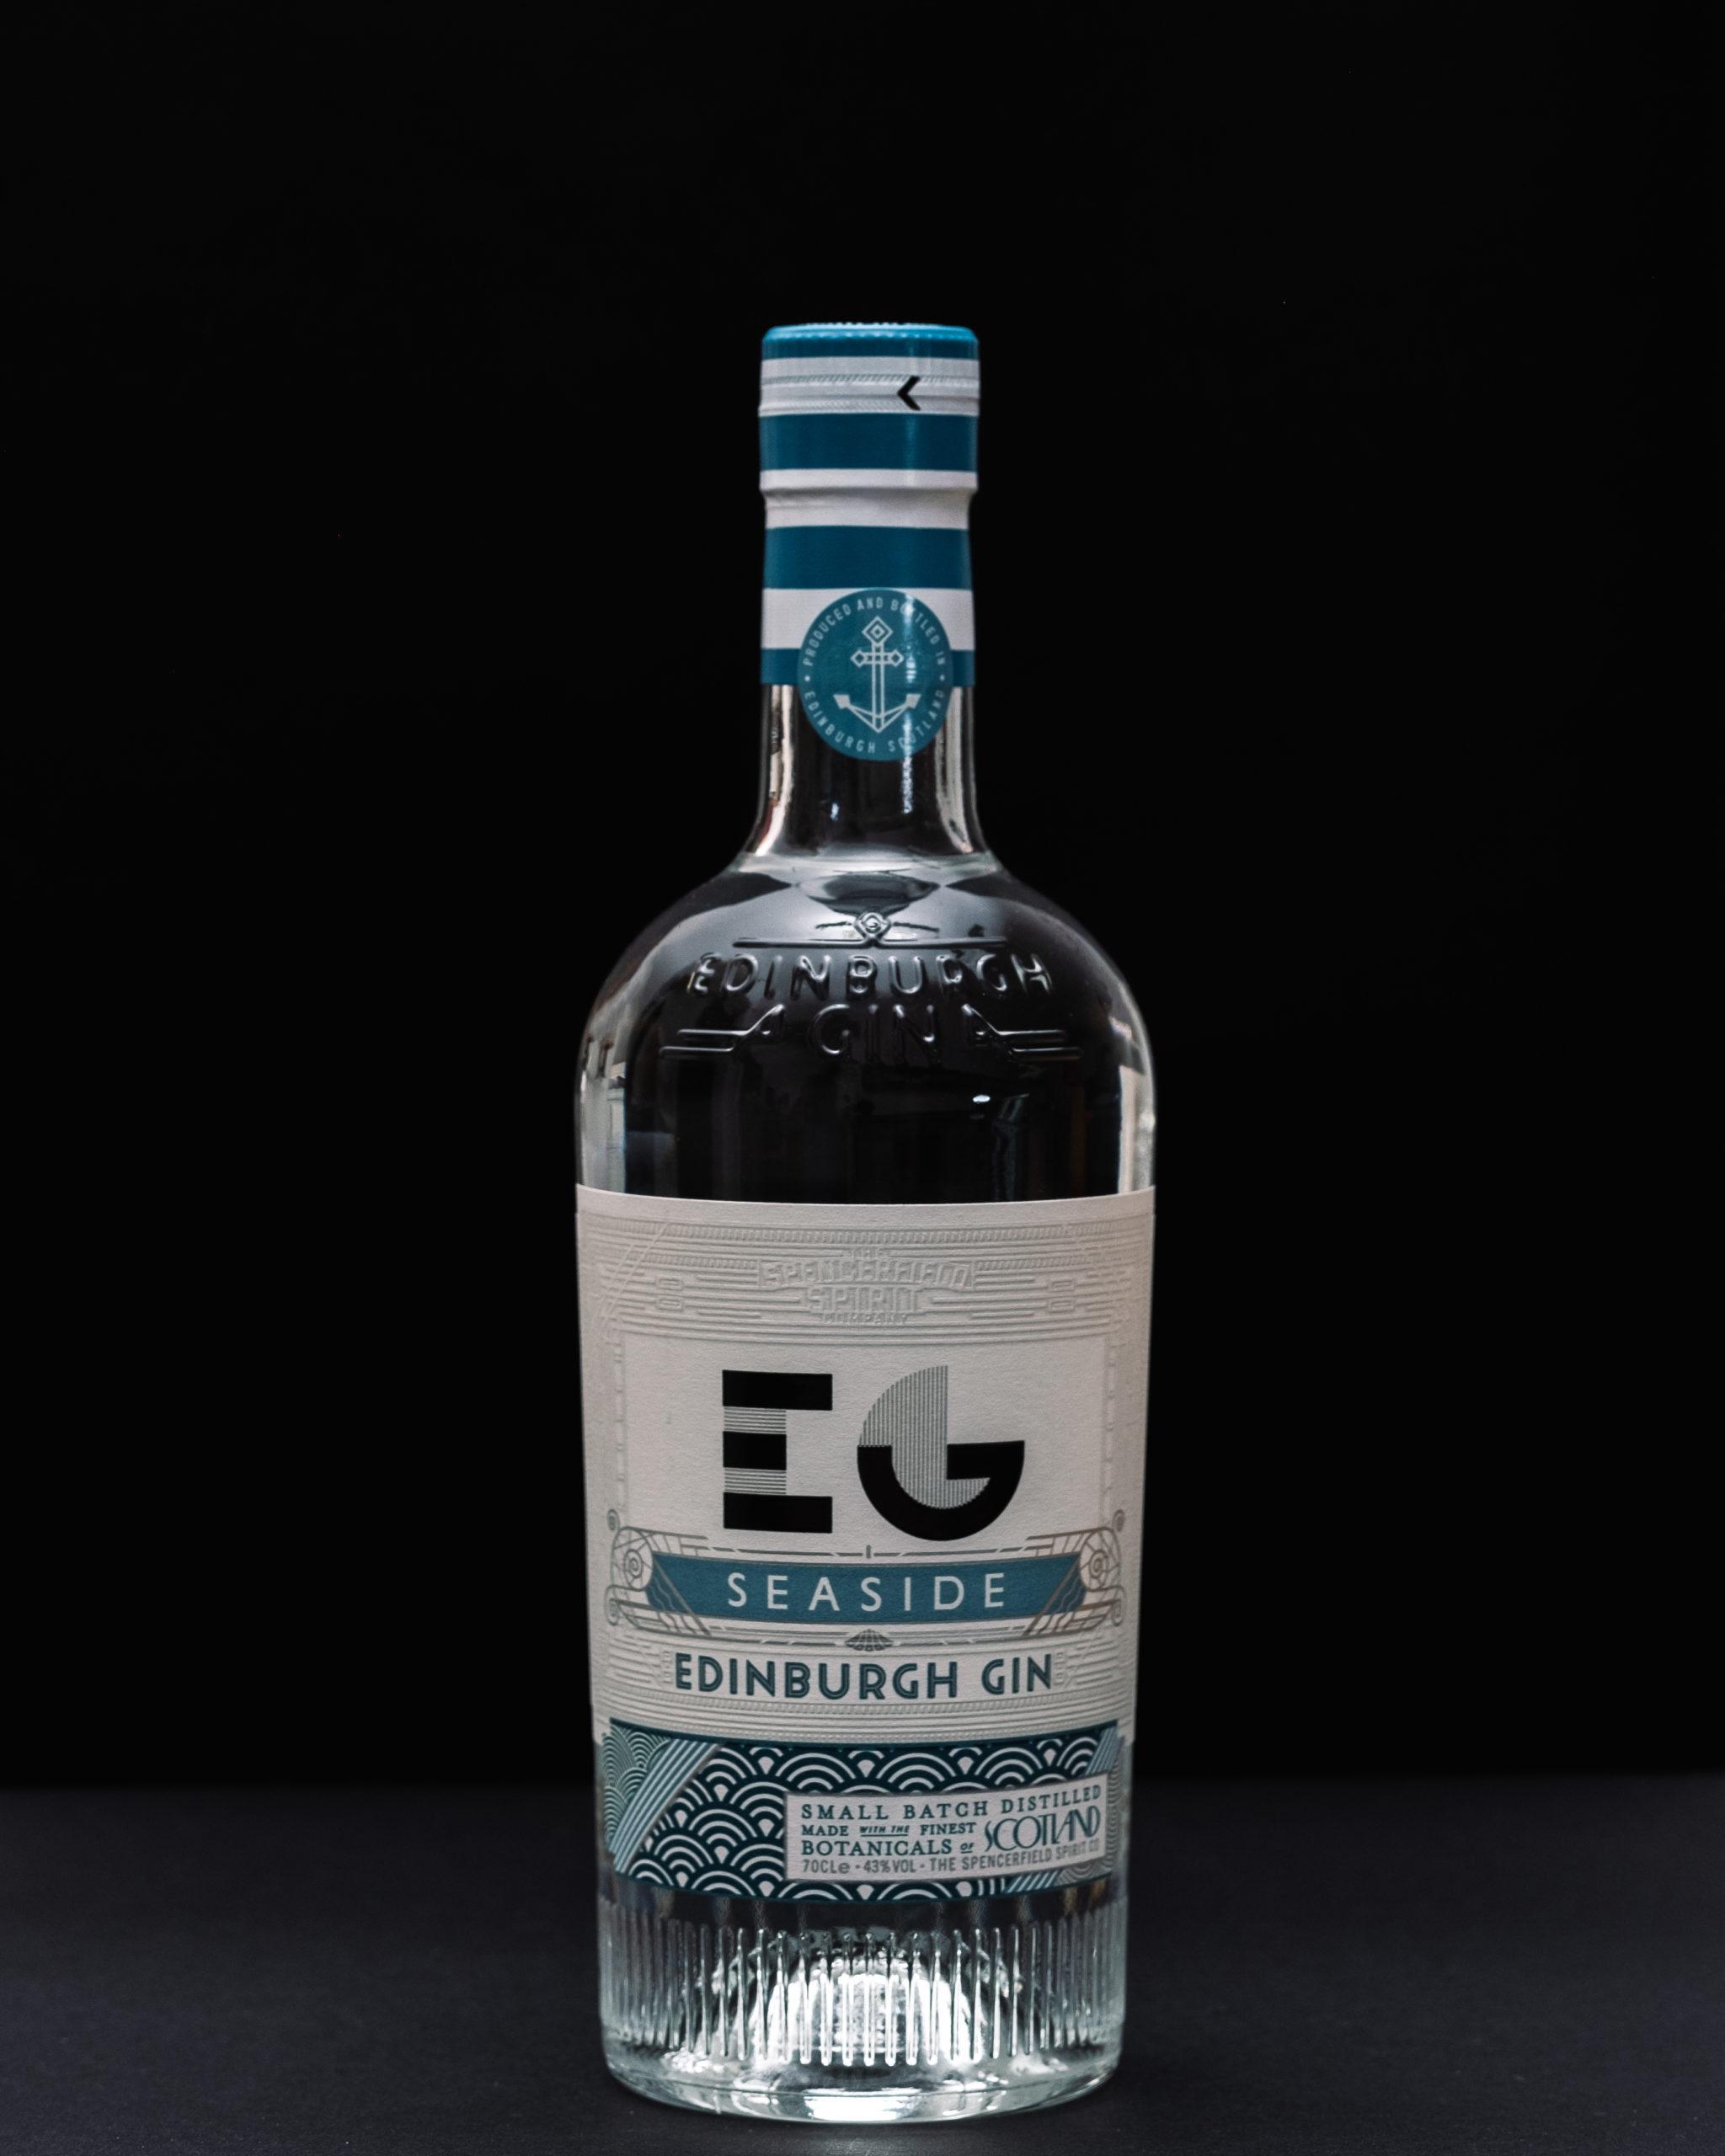 Le Gin Edinburgh Sea Side